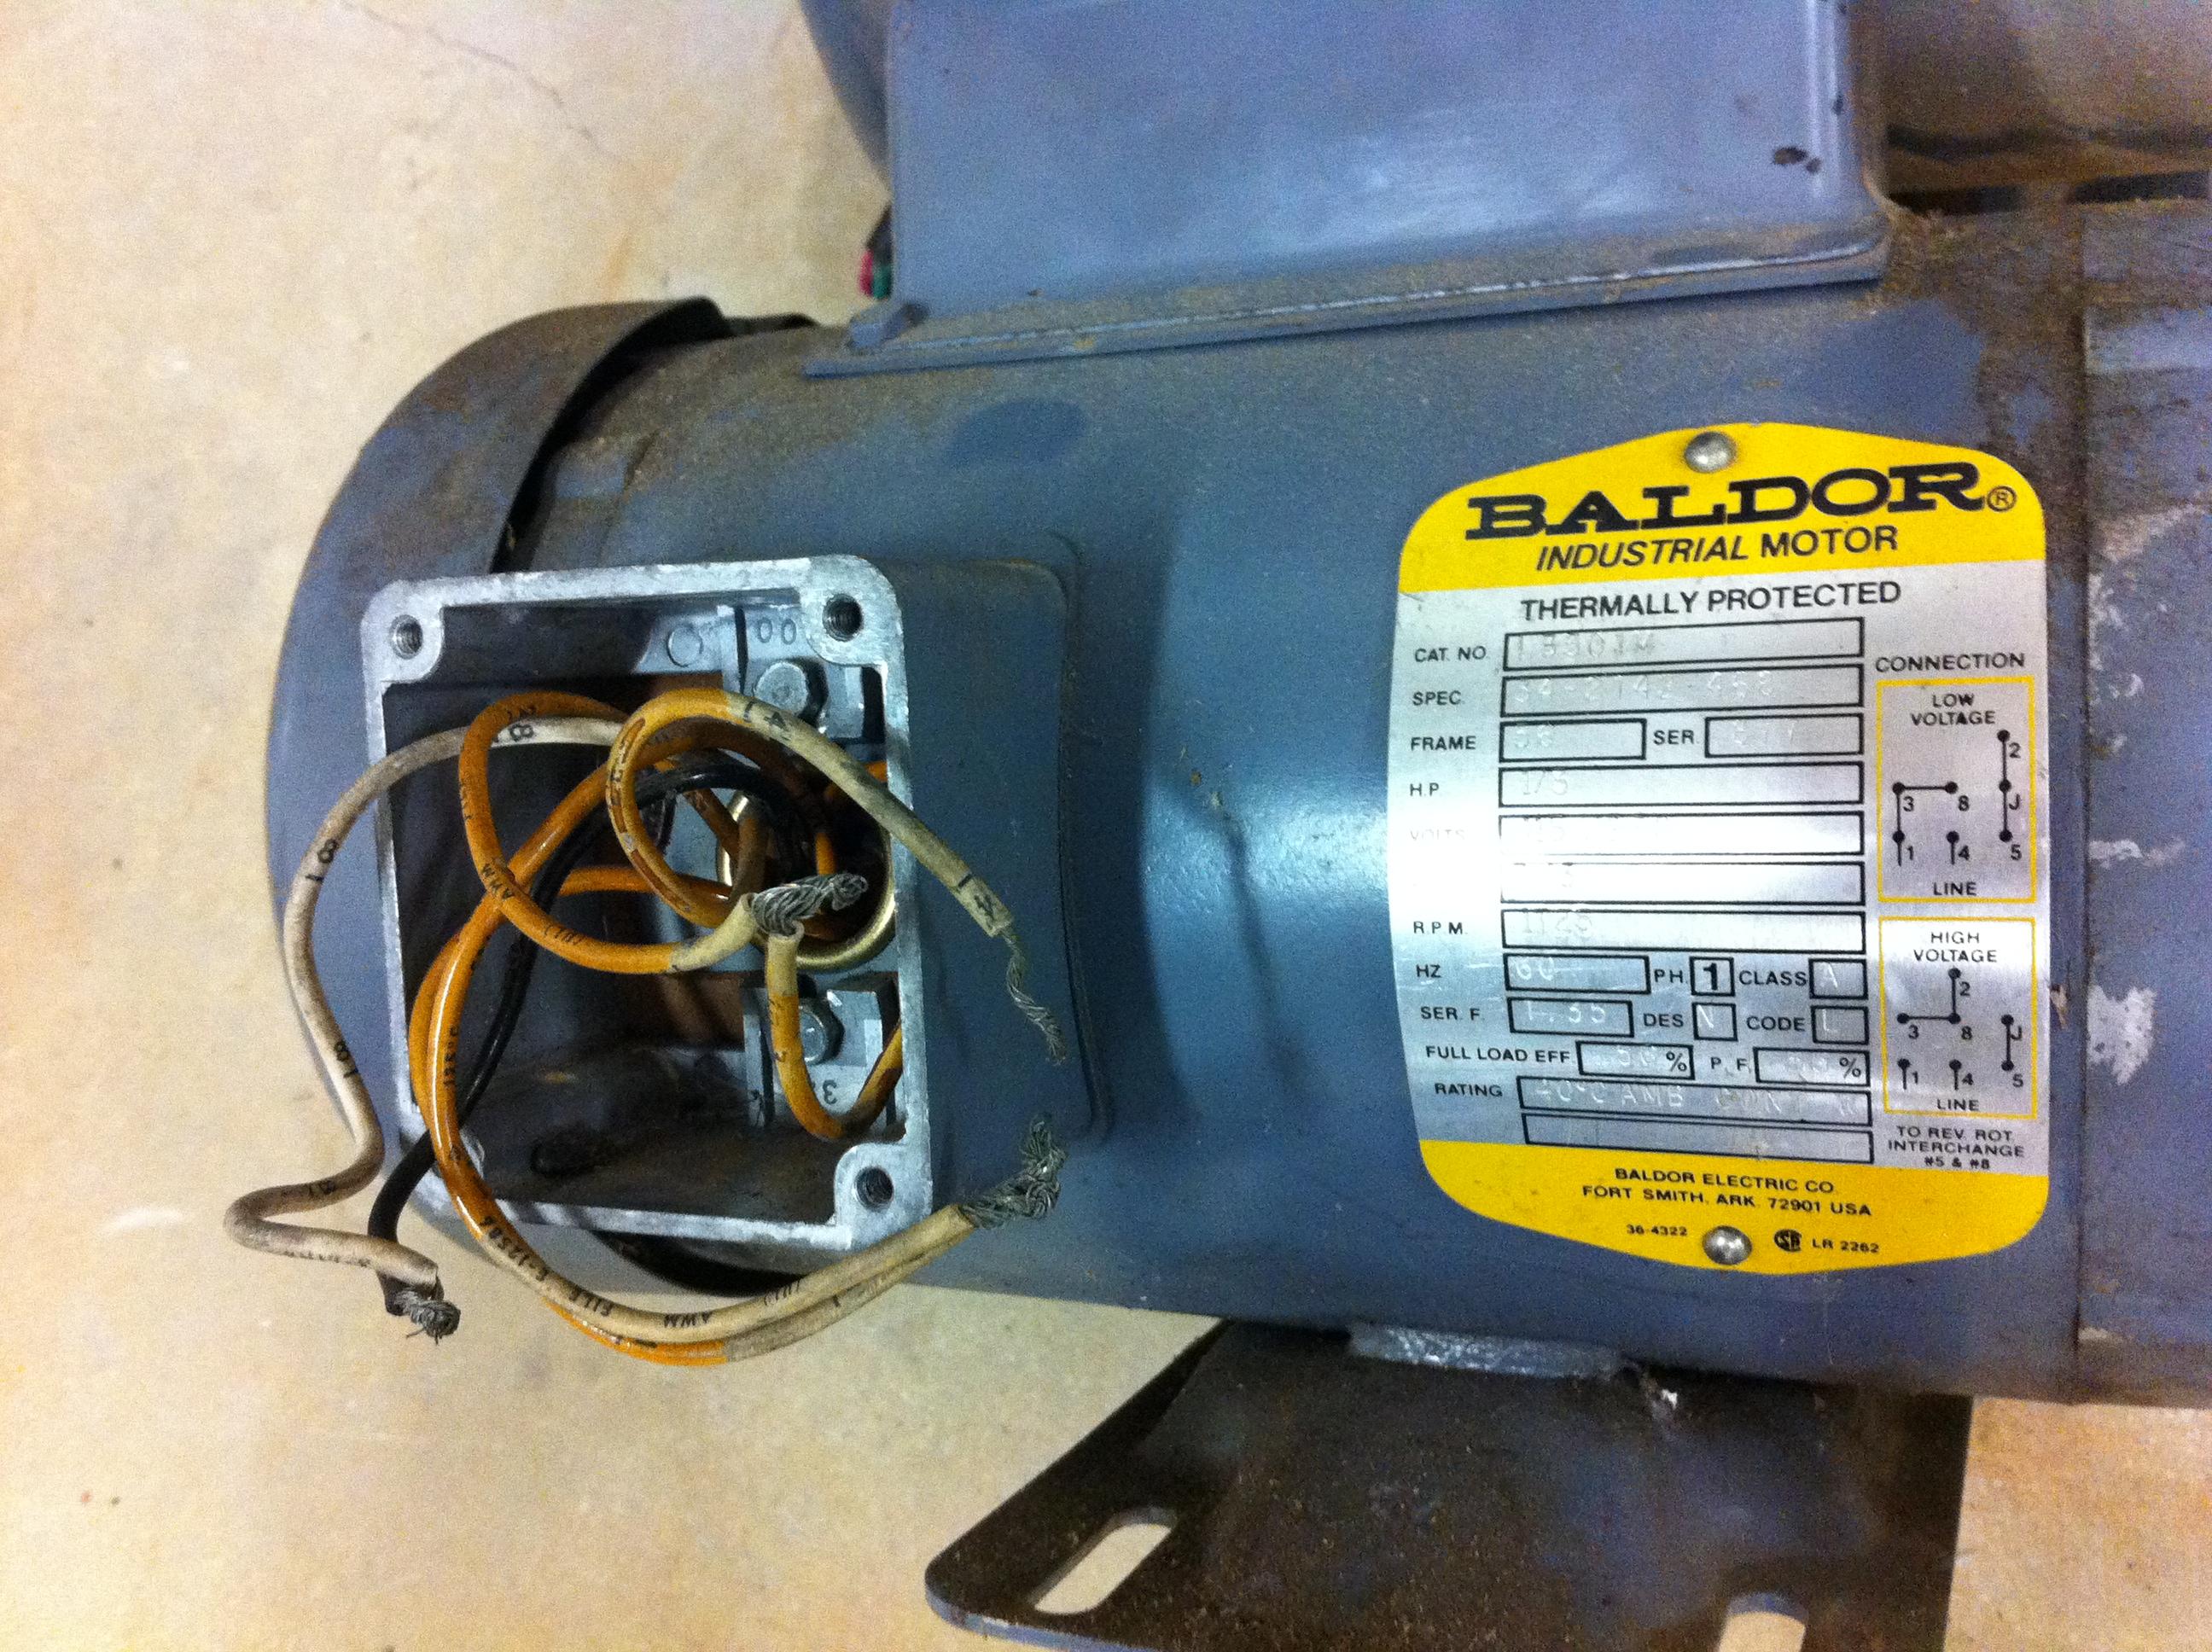 Baldor Motor Schematic | Manual E-Books - Baldor Motor Wiring Diagram